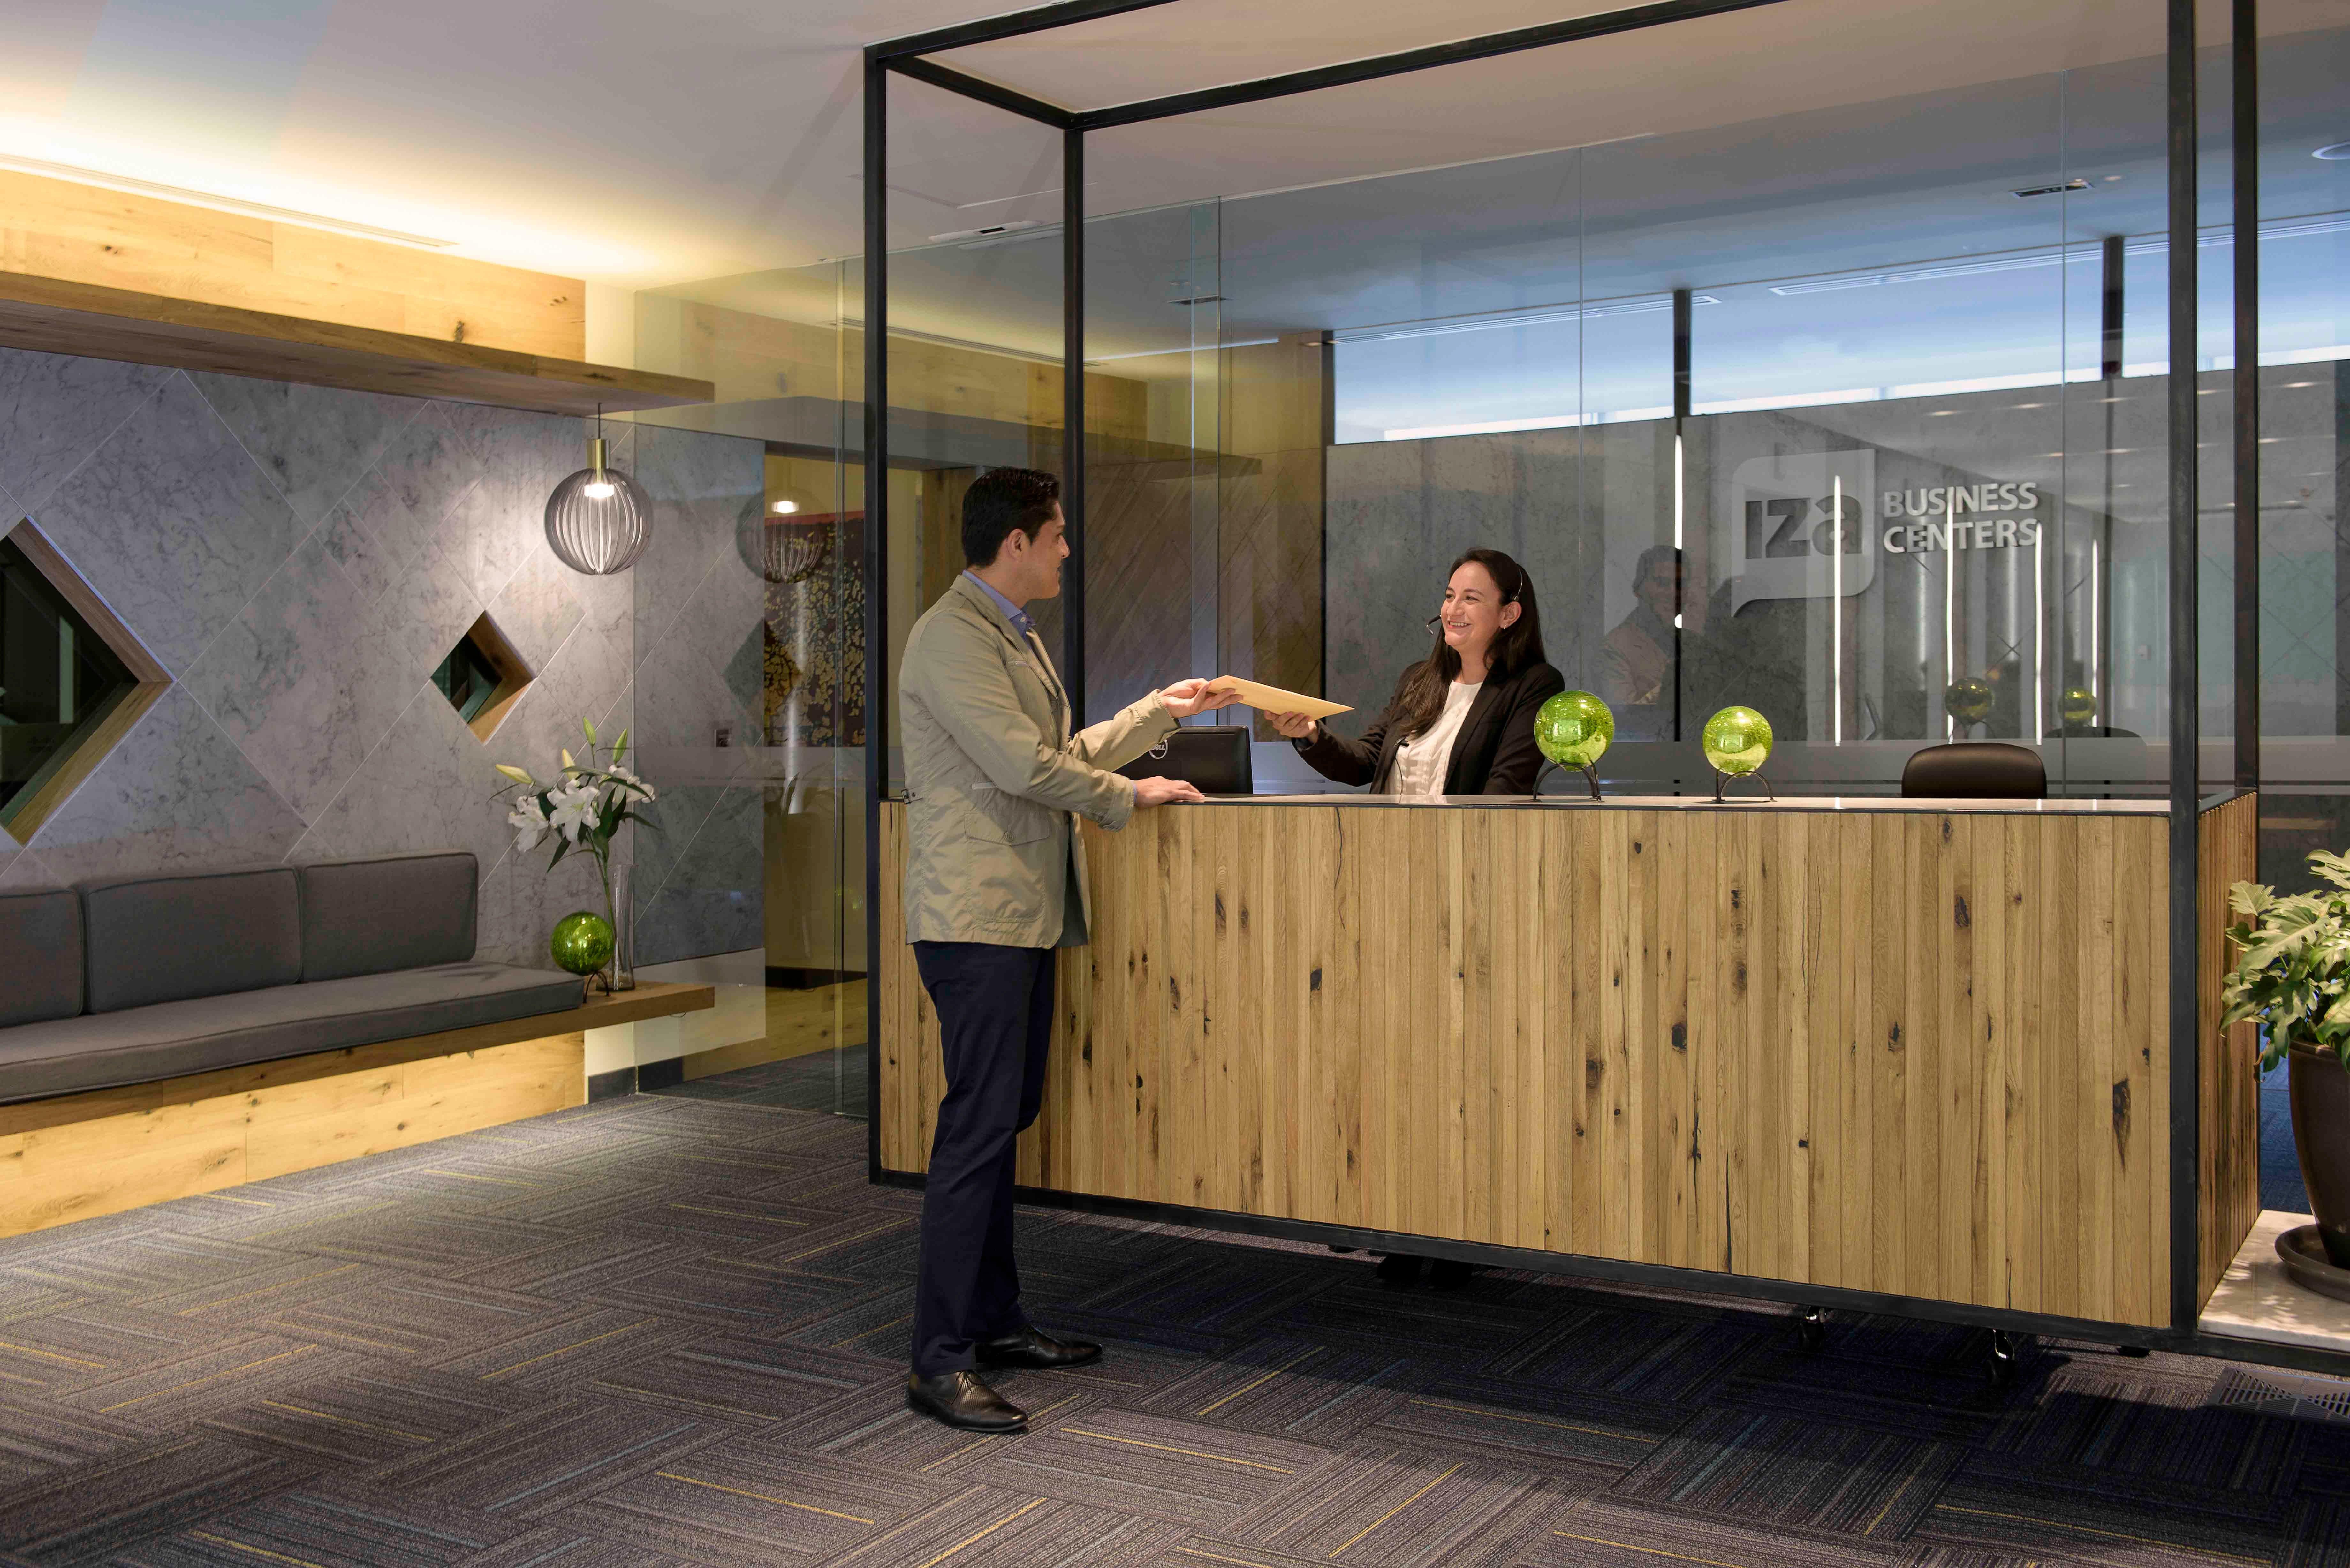 Recepcion IZA Business Centers atendiendo cliente oficina